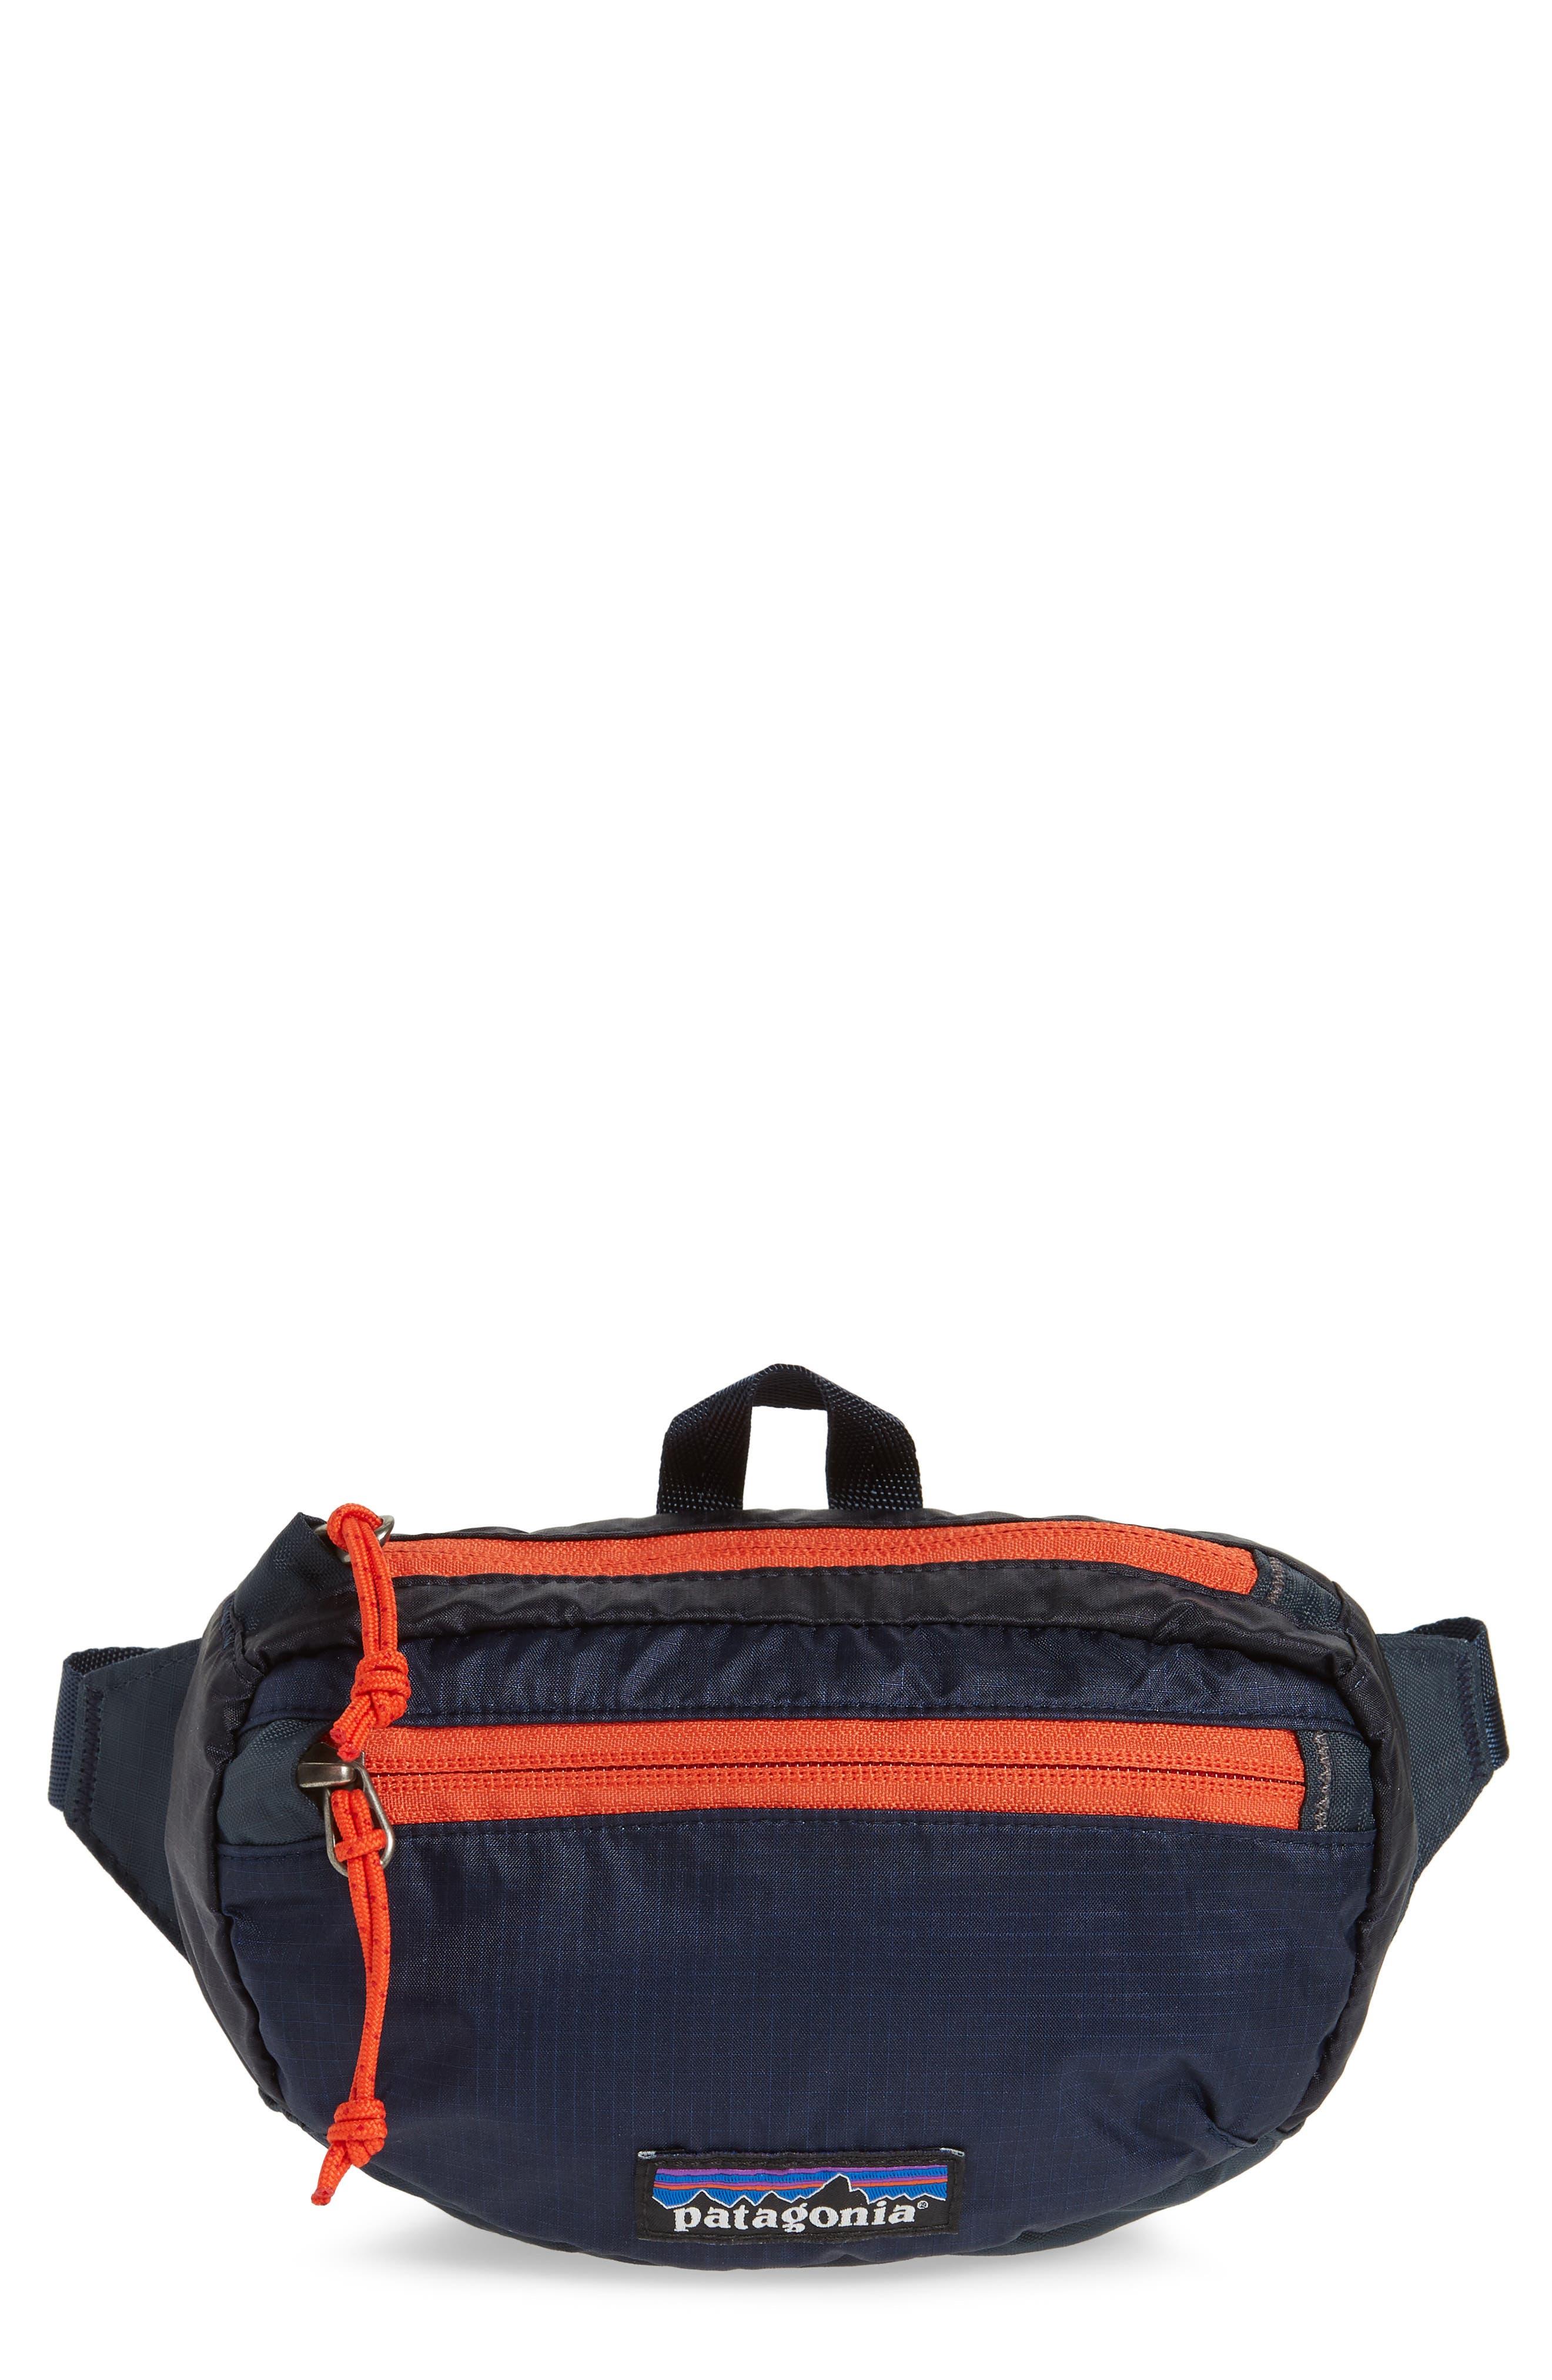 Patagonia Travel Belt Bag